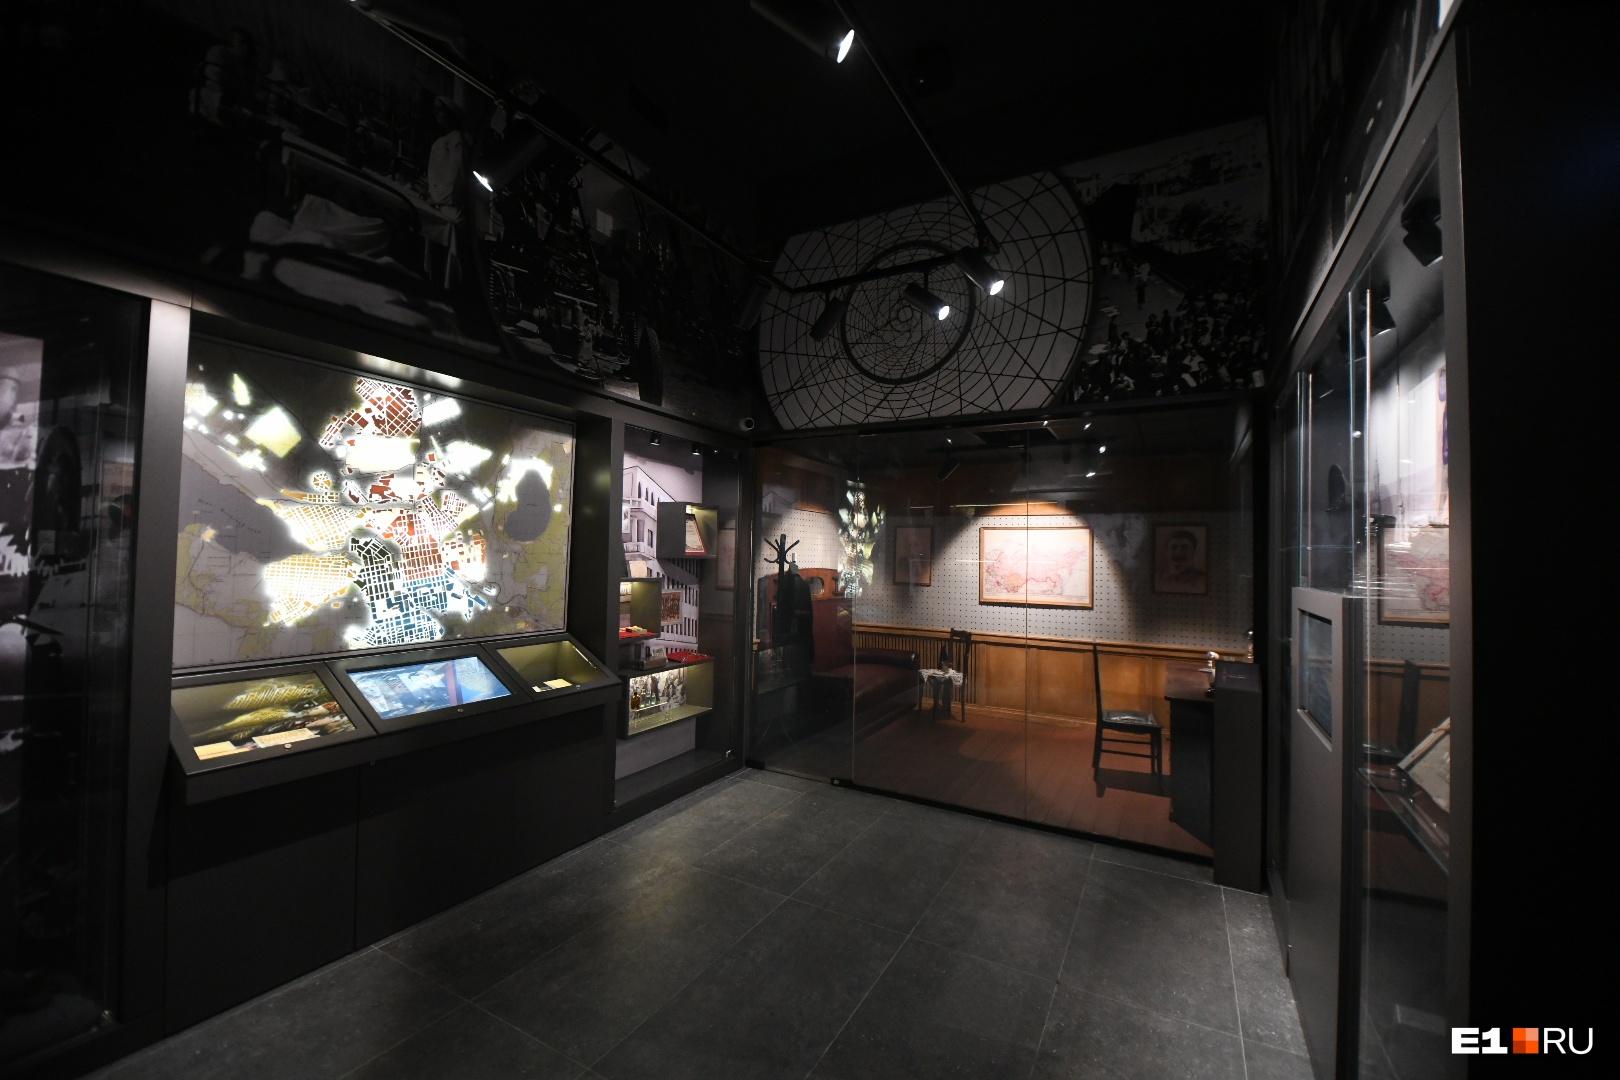 Гитлер считал Левитана врагом номер 1: в Екатеринбурге открыли музей легендарного диктора